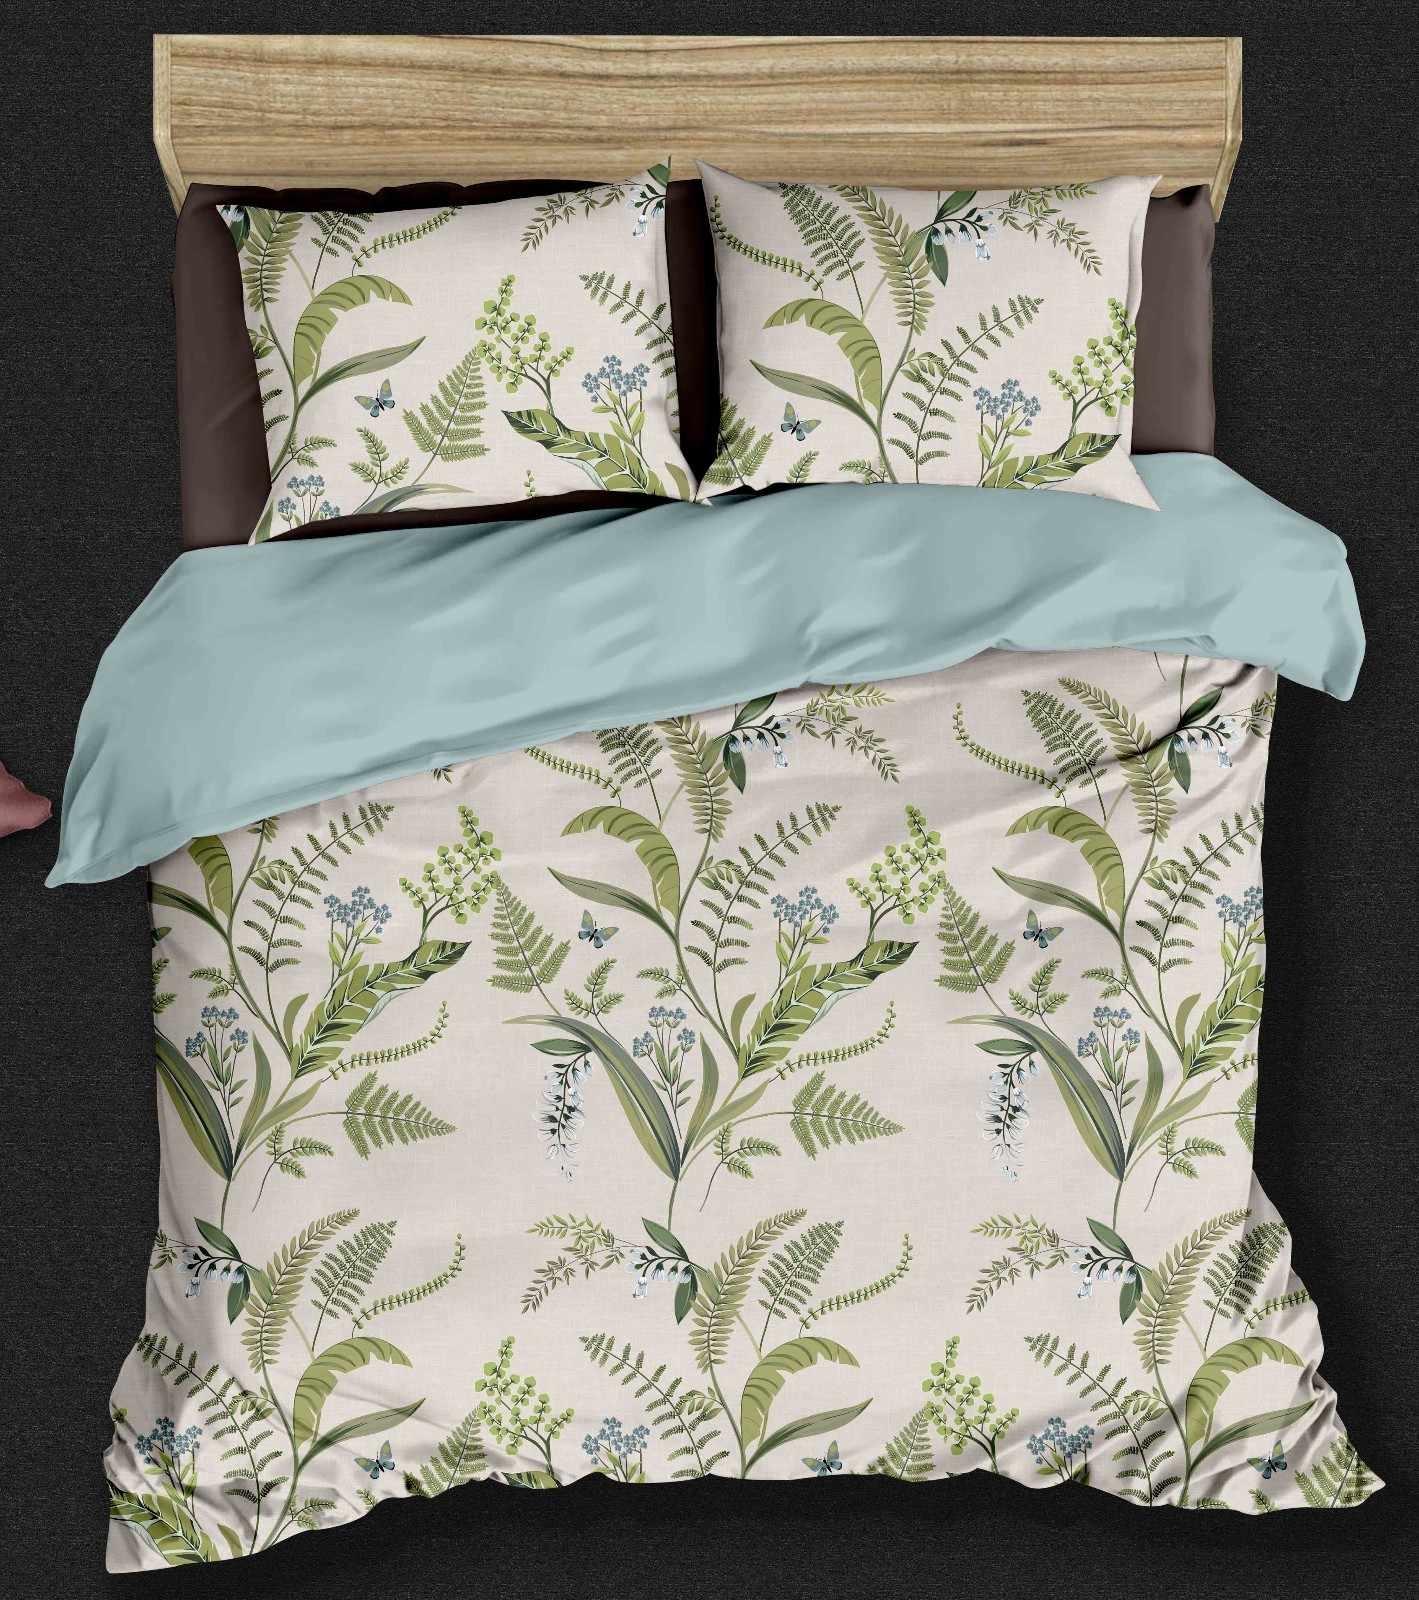 Wholesale peony bedding organic comforter Daphne Brand